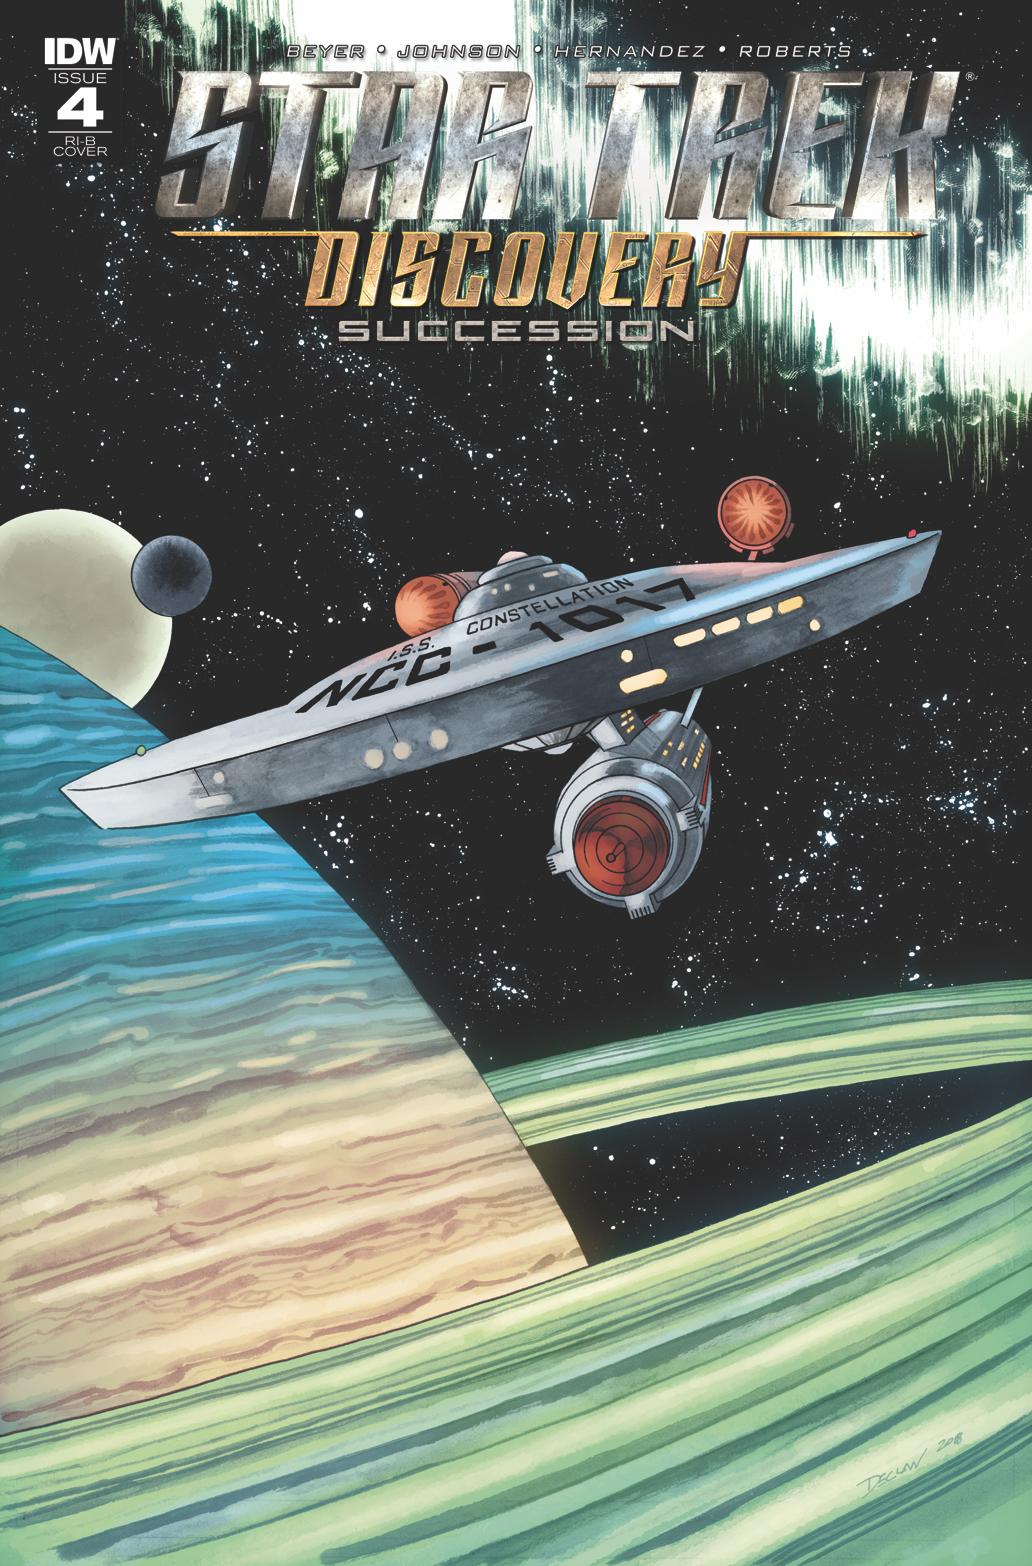 STAR TREK DISCOVERY SUCCESSION #4 25 COPY INCV